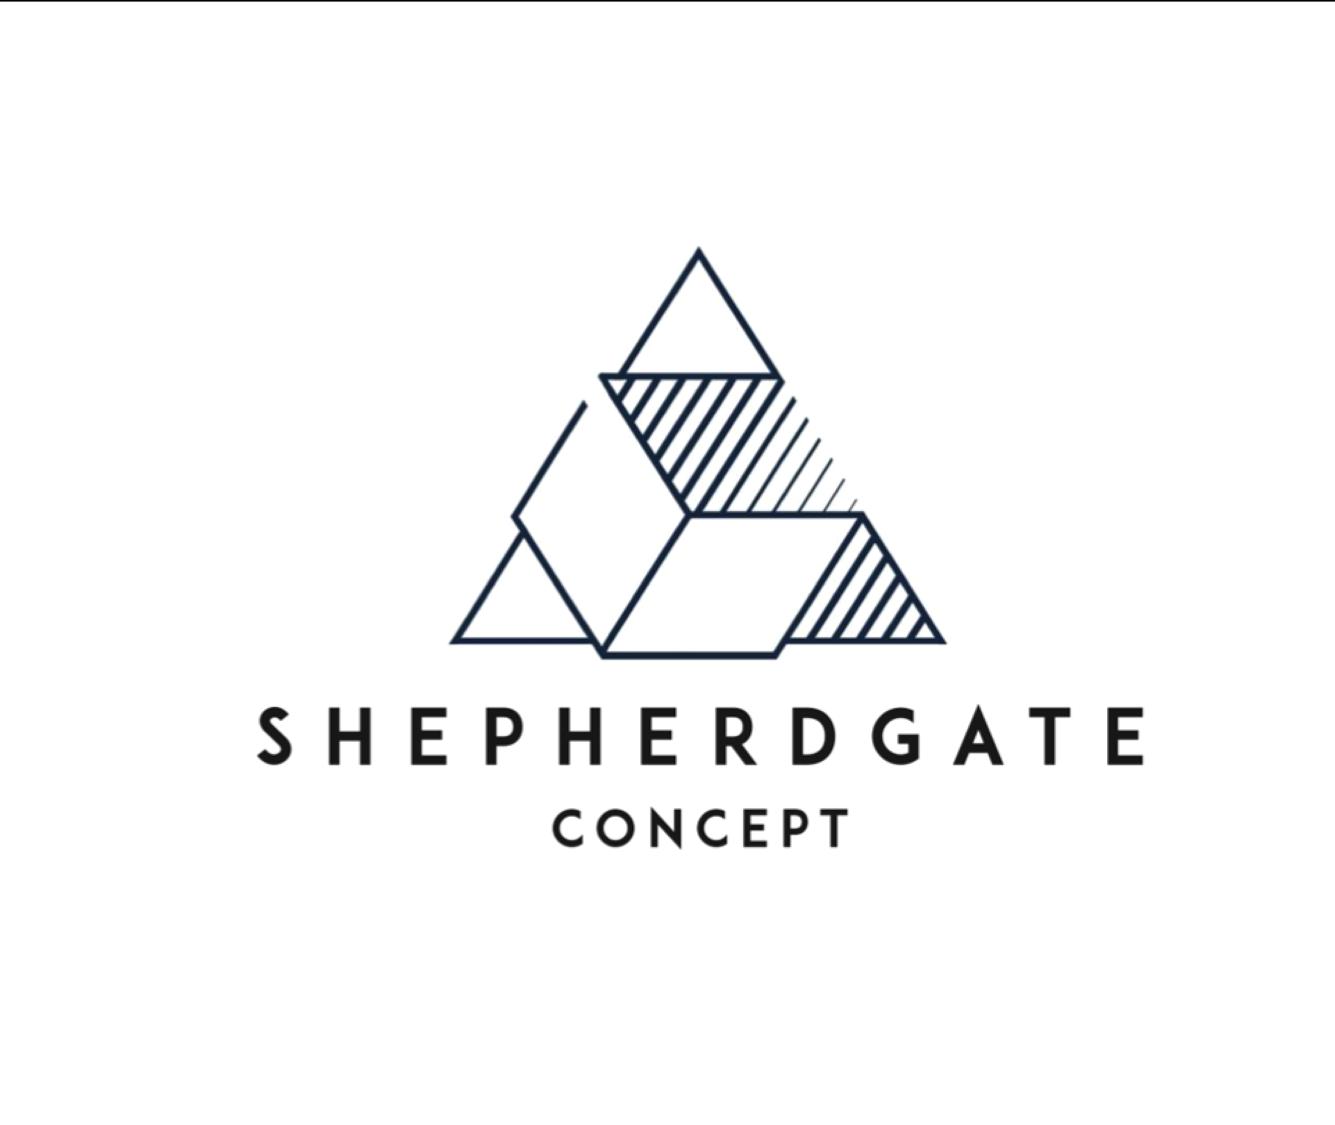 shepherdgate-concept Logo